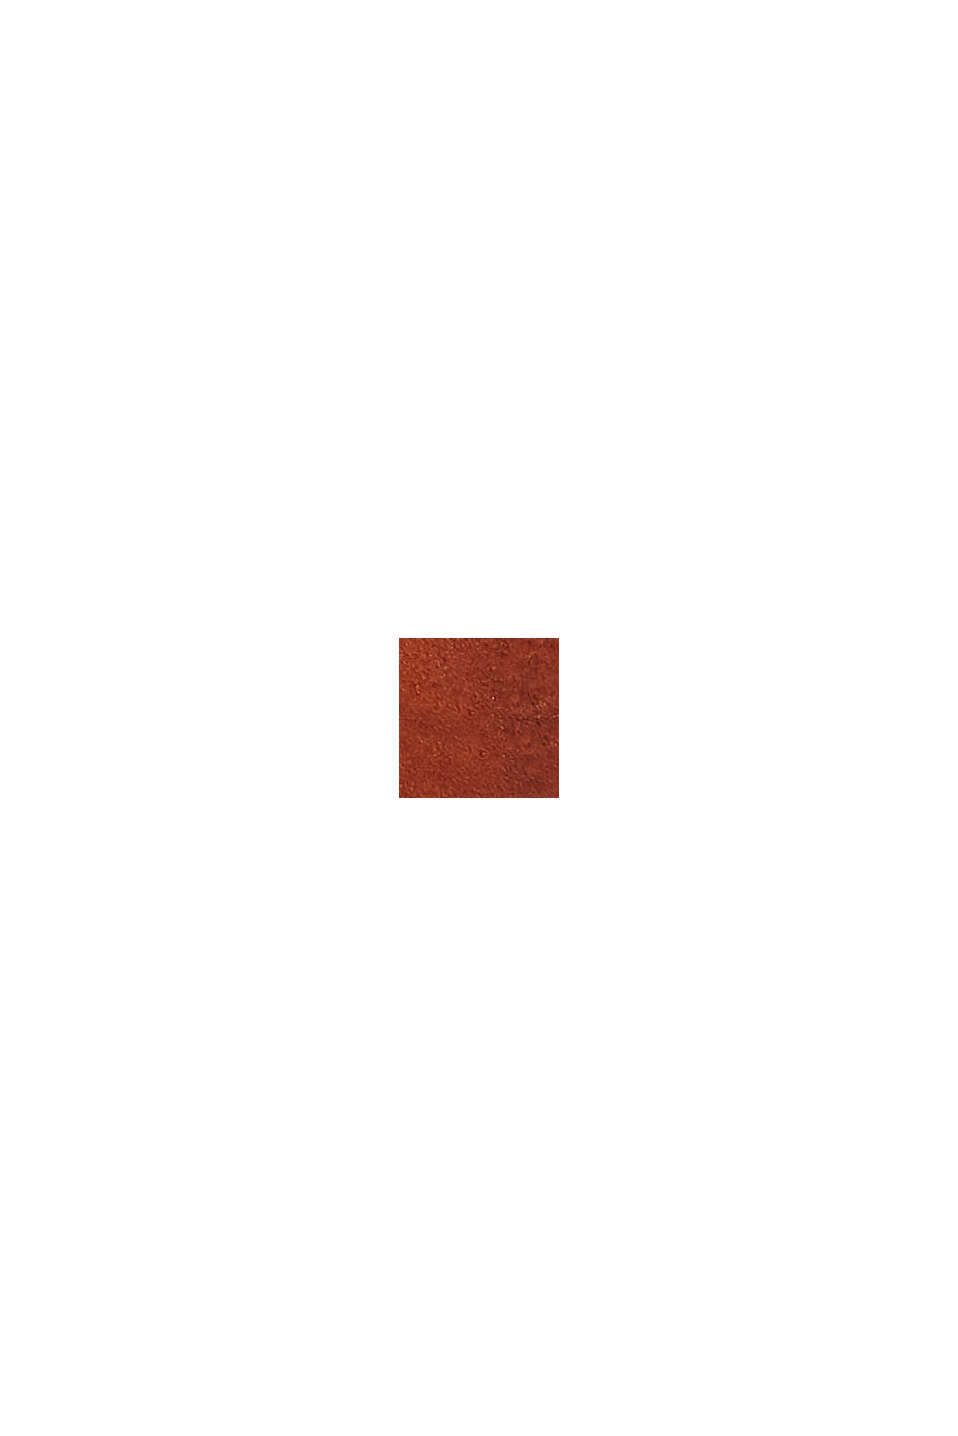 En cuir: la ceinture à boucle en métal, TOFFEE, swatch